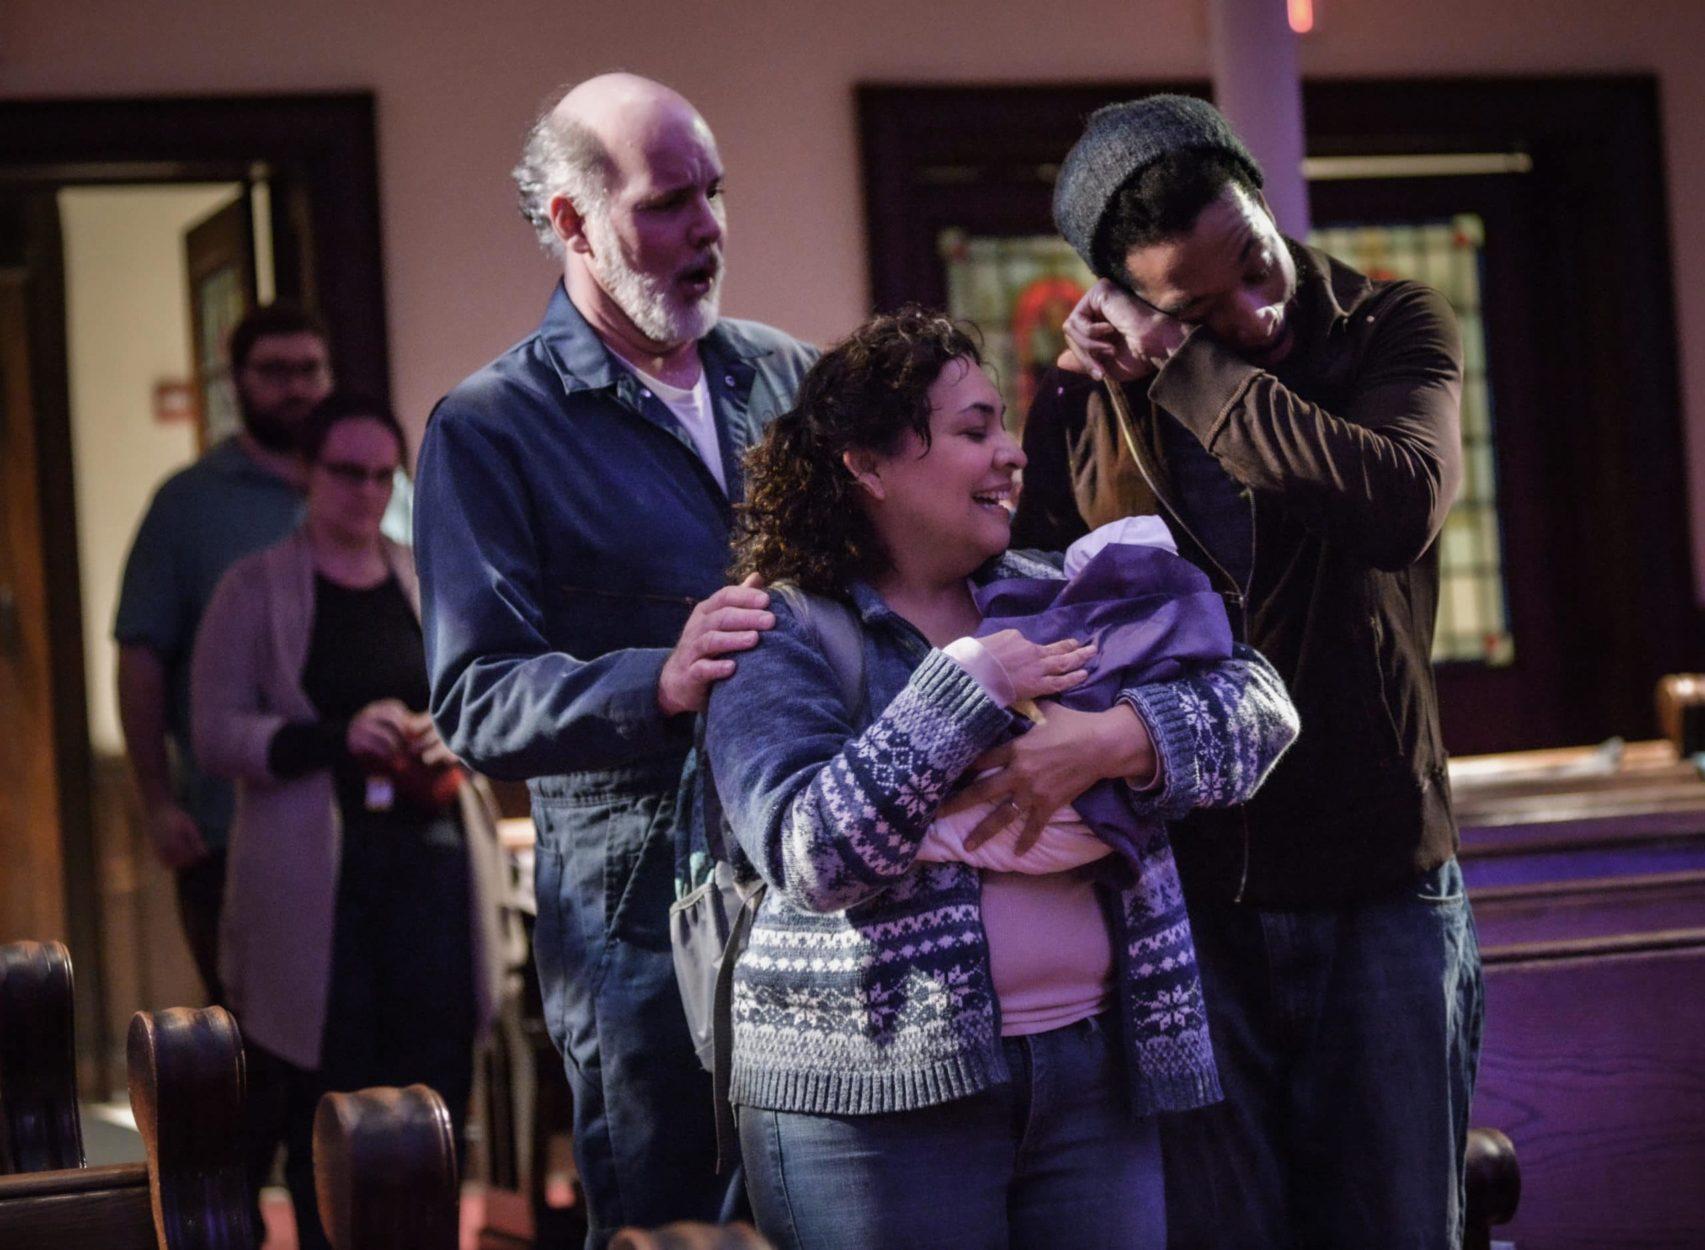 Kerry Wilkerson, Elizabeth Mondragon, and Jarrod Lee in 'L'enfance du Christ.' Photo by RX Loft.